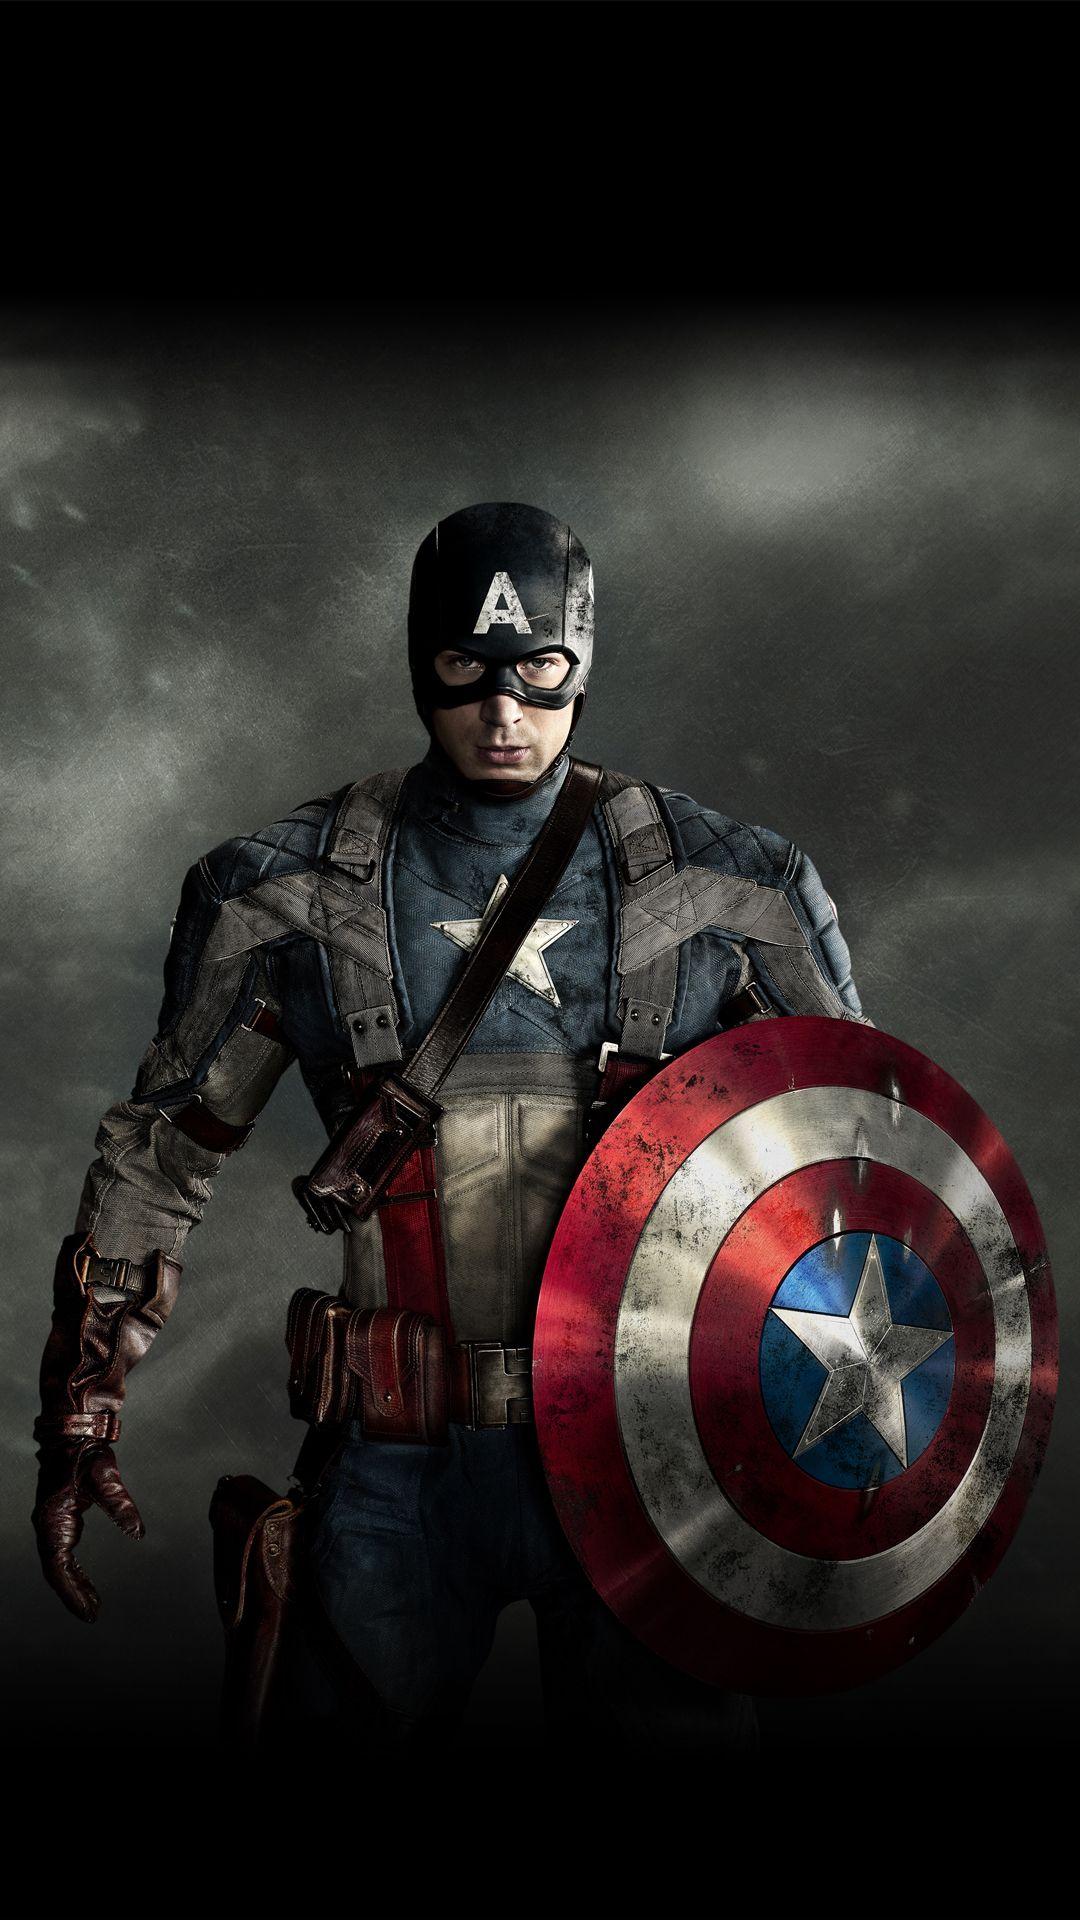 1,080×1,920 píxeles Captain america